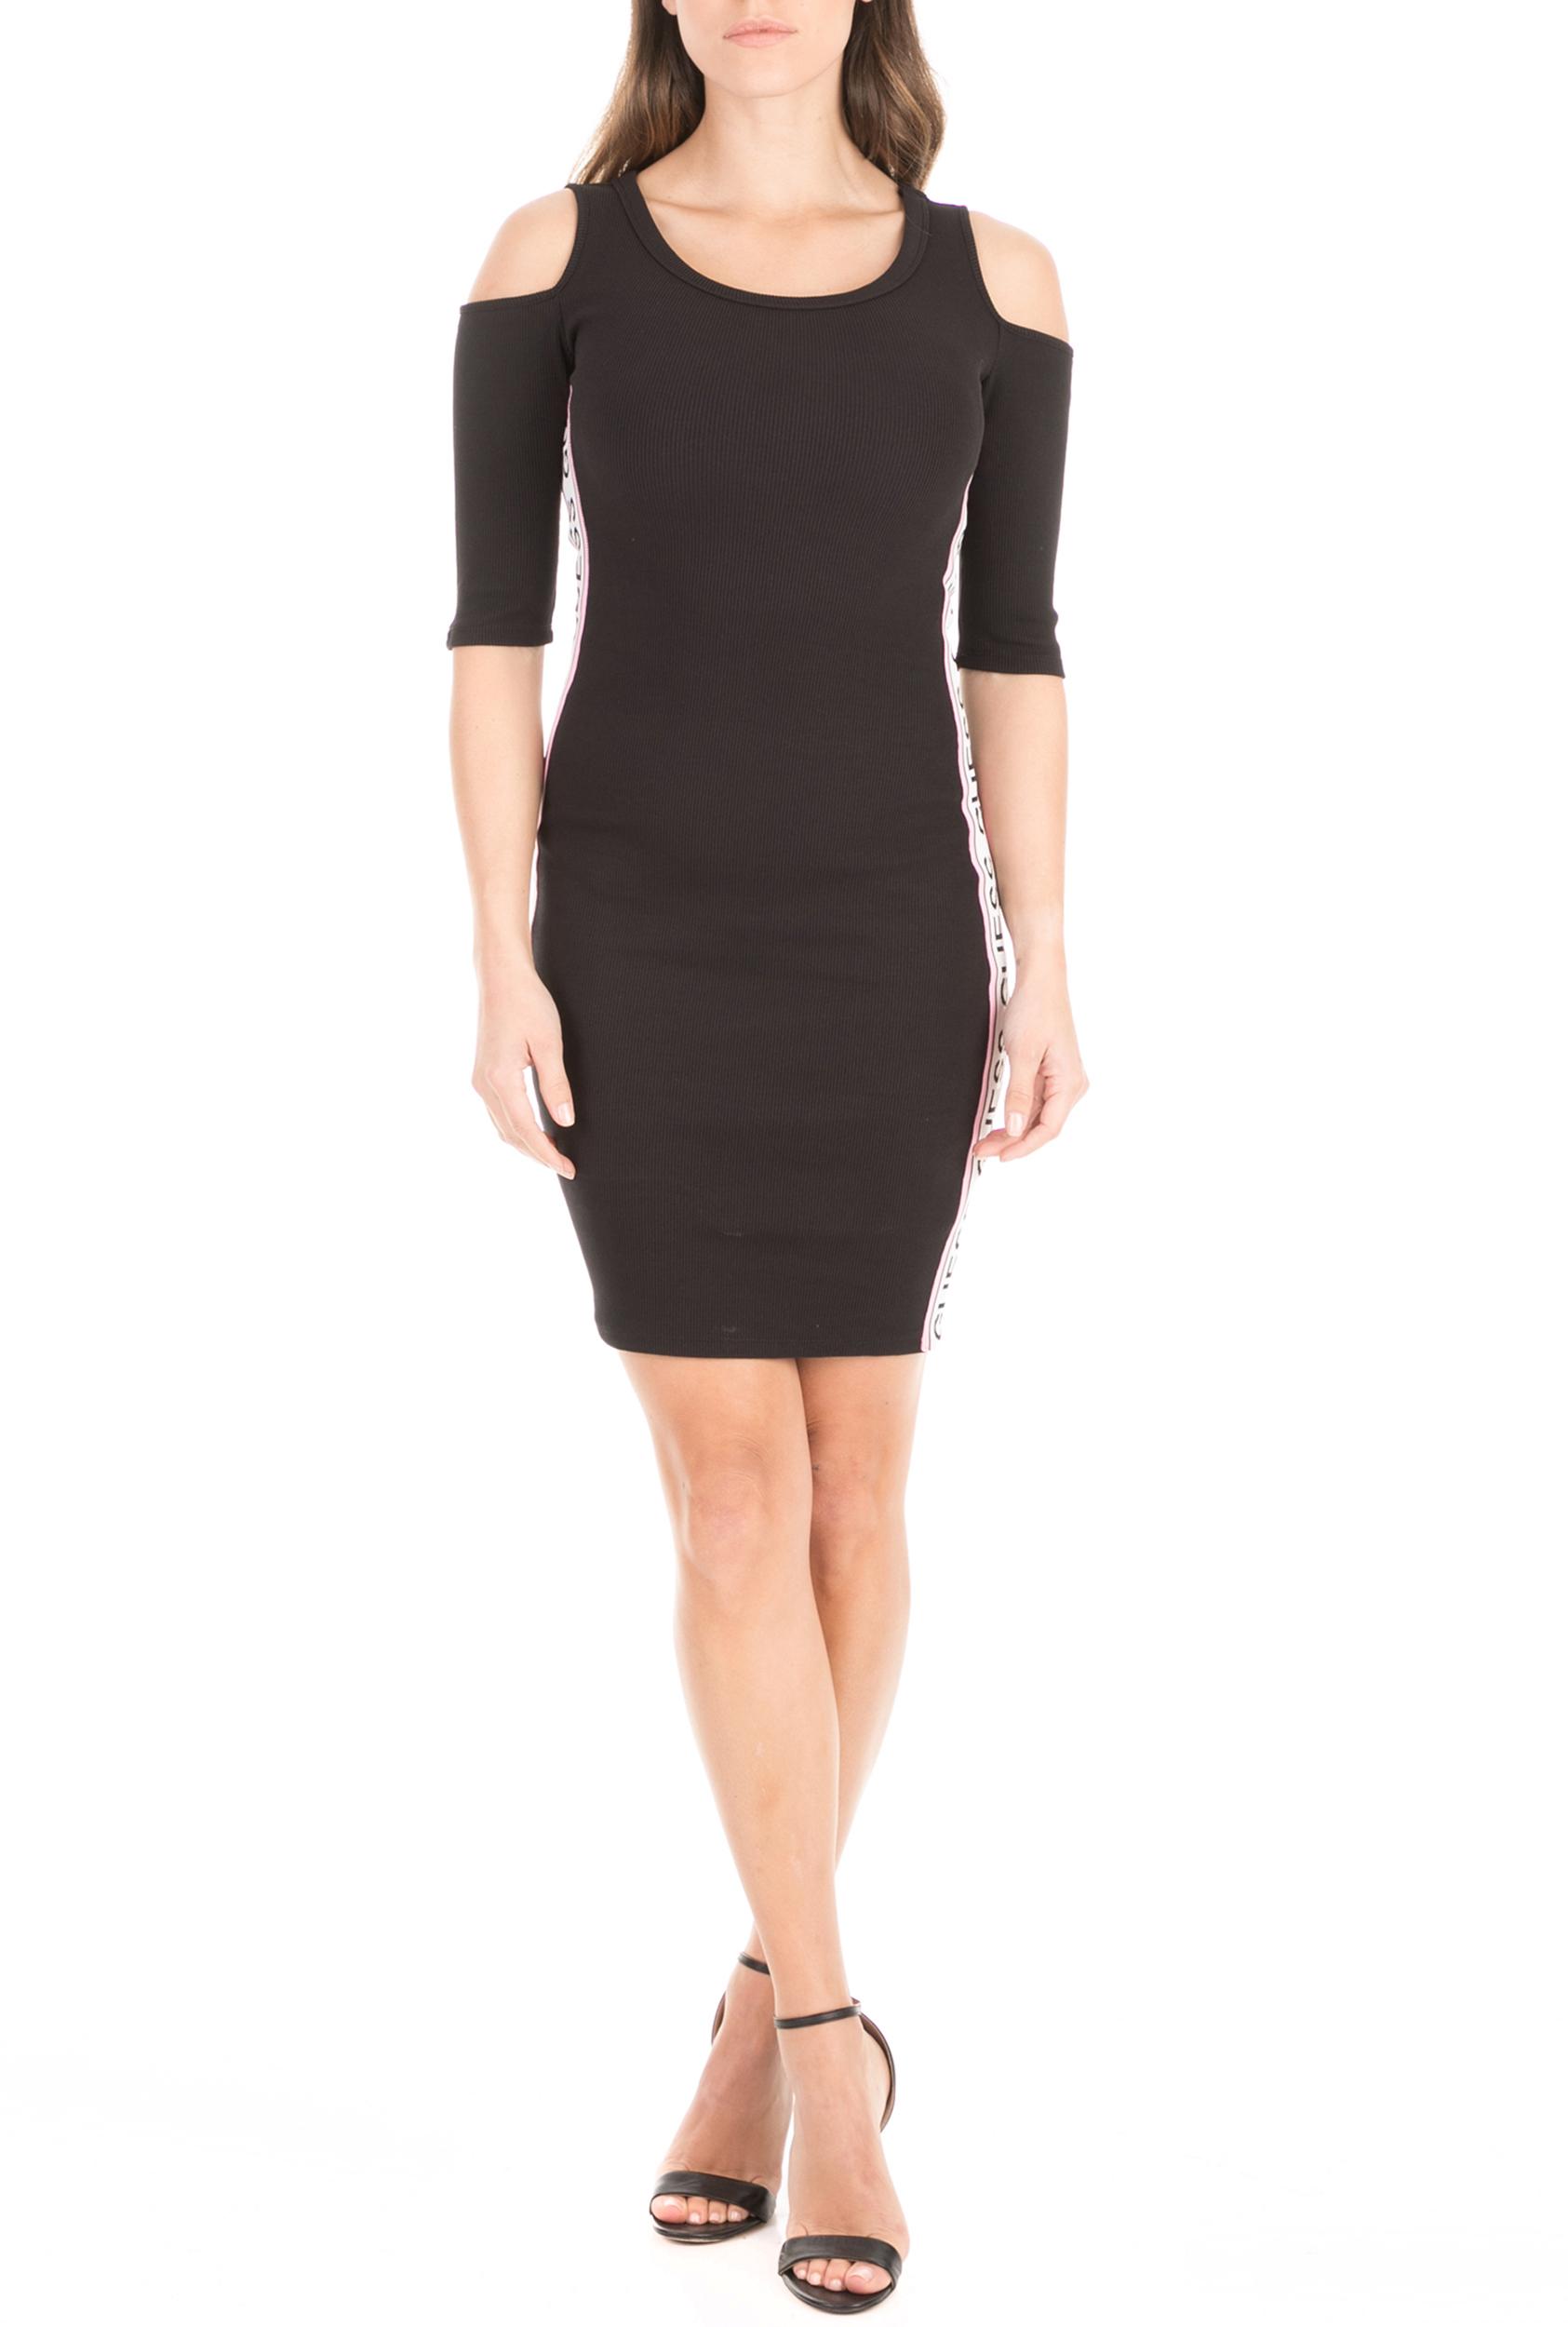 GUESS - Γυναικείο μίνι φόρεμα GUESS ALMA μαύρο γυναικεία ρούχα φόρεματα μίνι